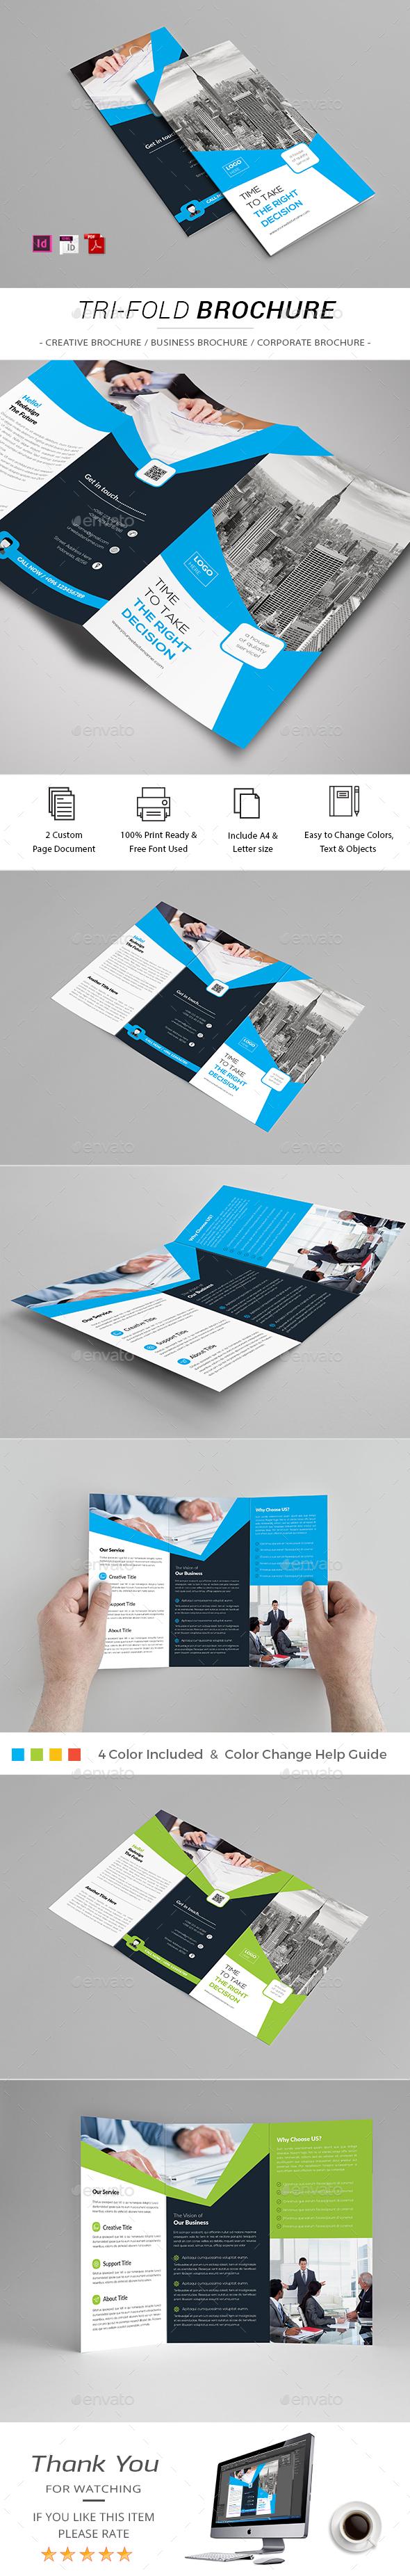 Tri-fold Brochure Template InDesign INDD | Brochure Templates ...